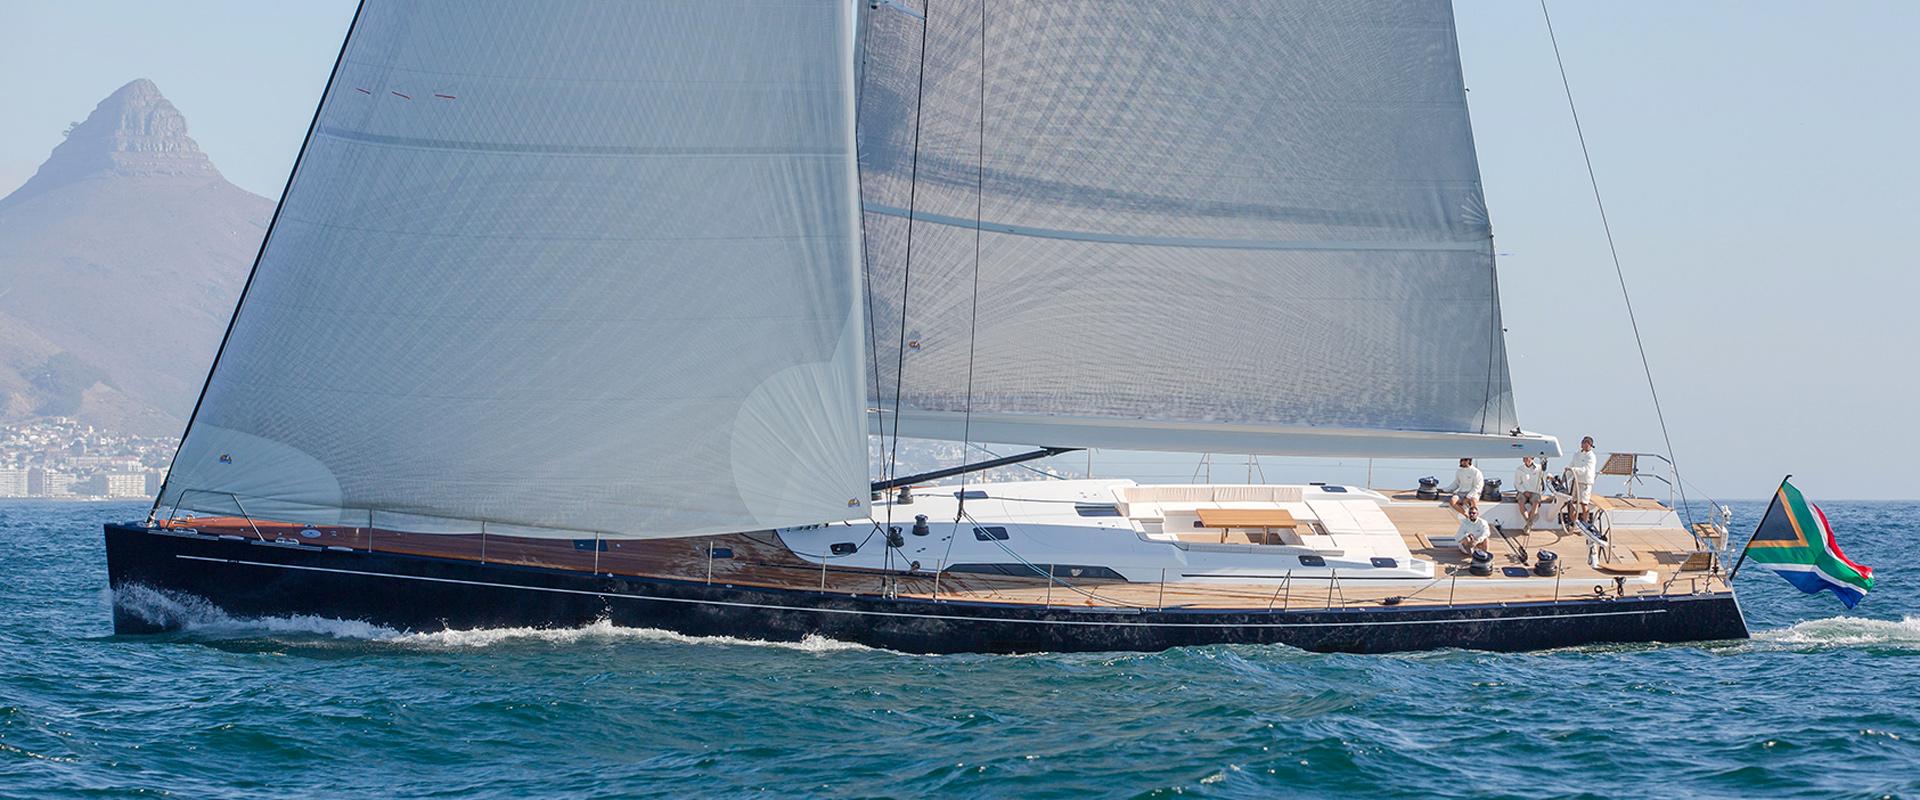 sws94-Sailing-21_1920x800